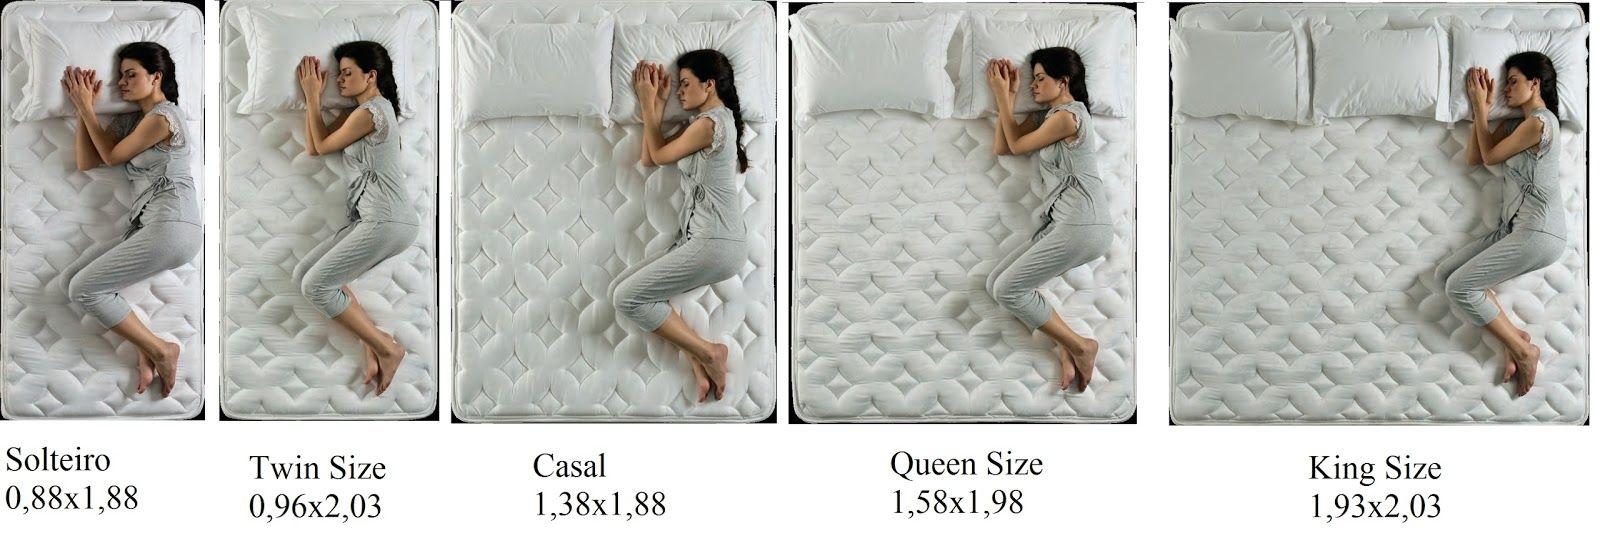 Medidas cama box king size pesquisa google dormit rios for Cama king size peru medidas